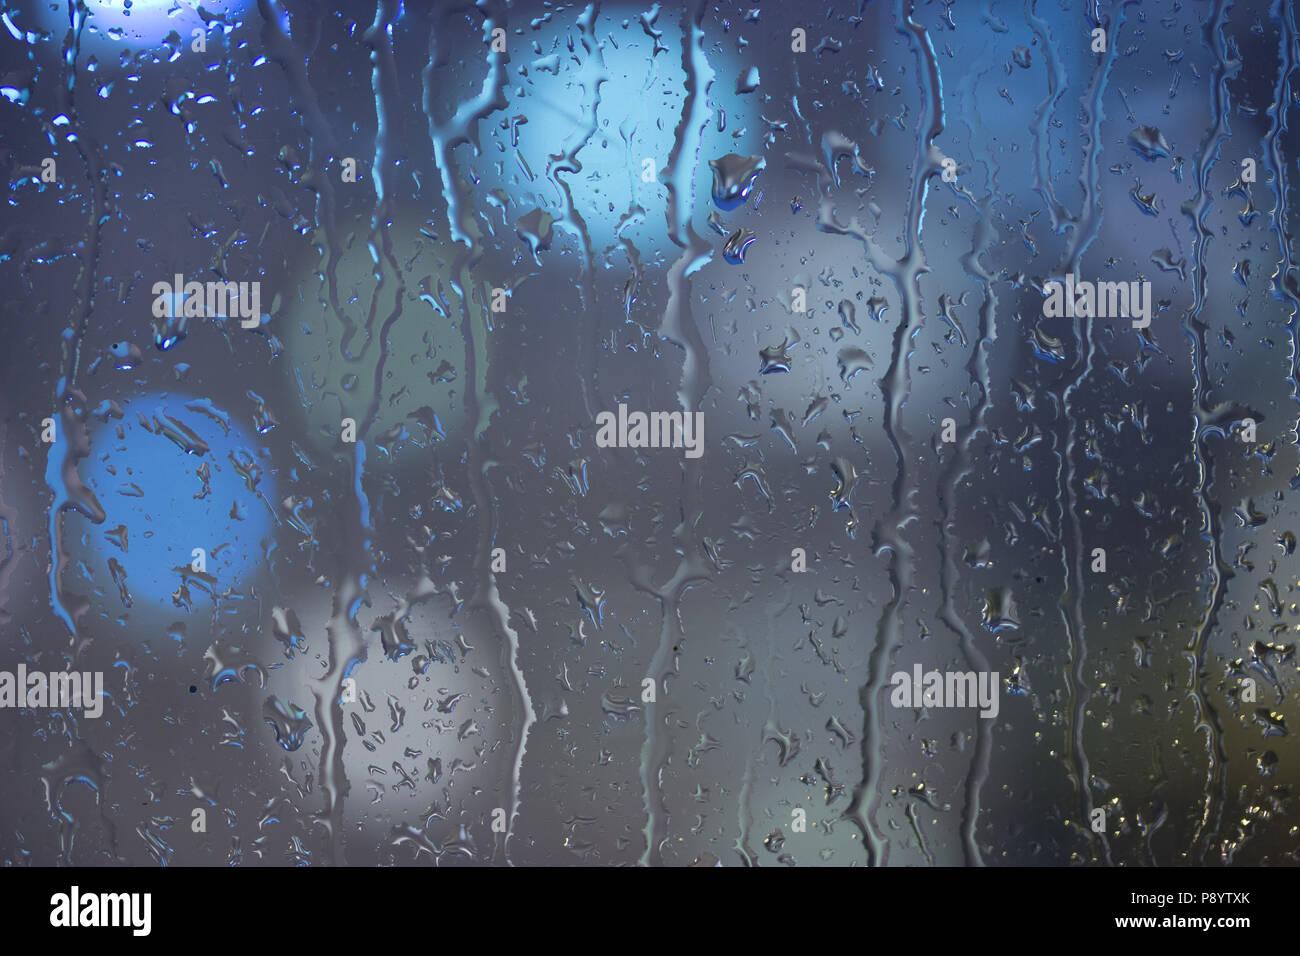 Drops of rain on window, night. blurred light - Stock Image